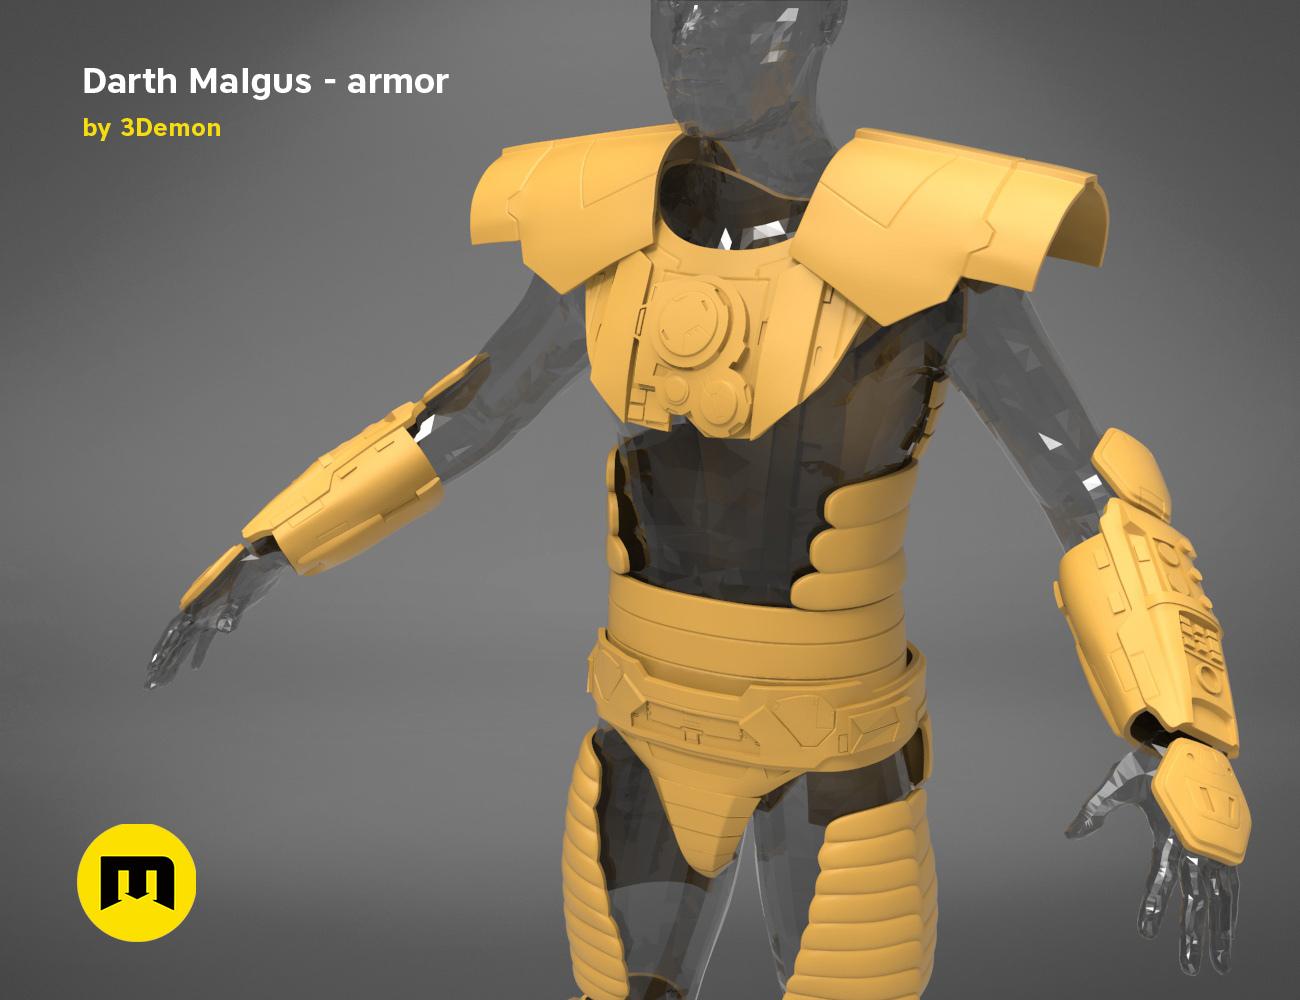 Darth-Malgus-armor-render_scene_basic.102 kopie.jpg Download STL file Darth Malgus's full size armor • Design to 3D print, 3D-mon